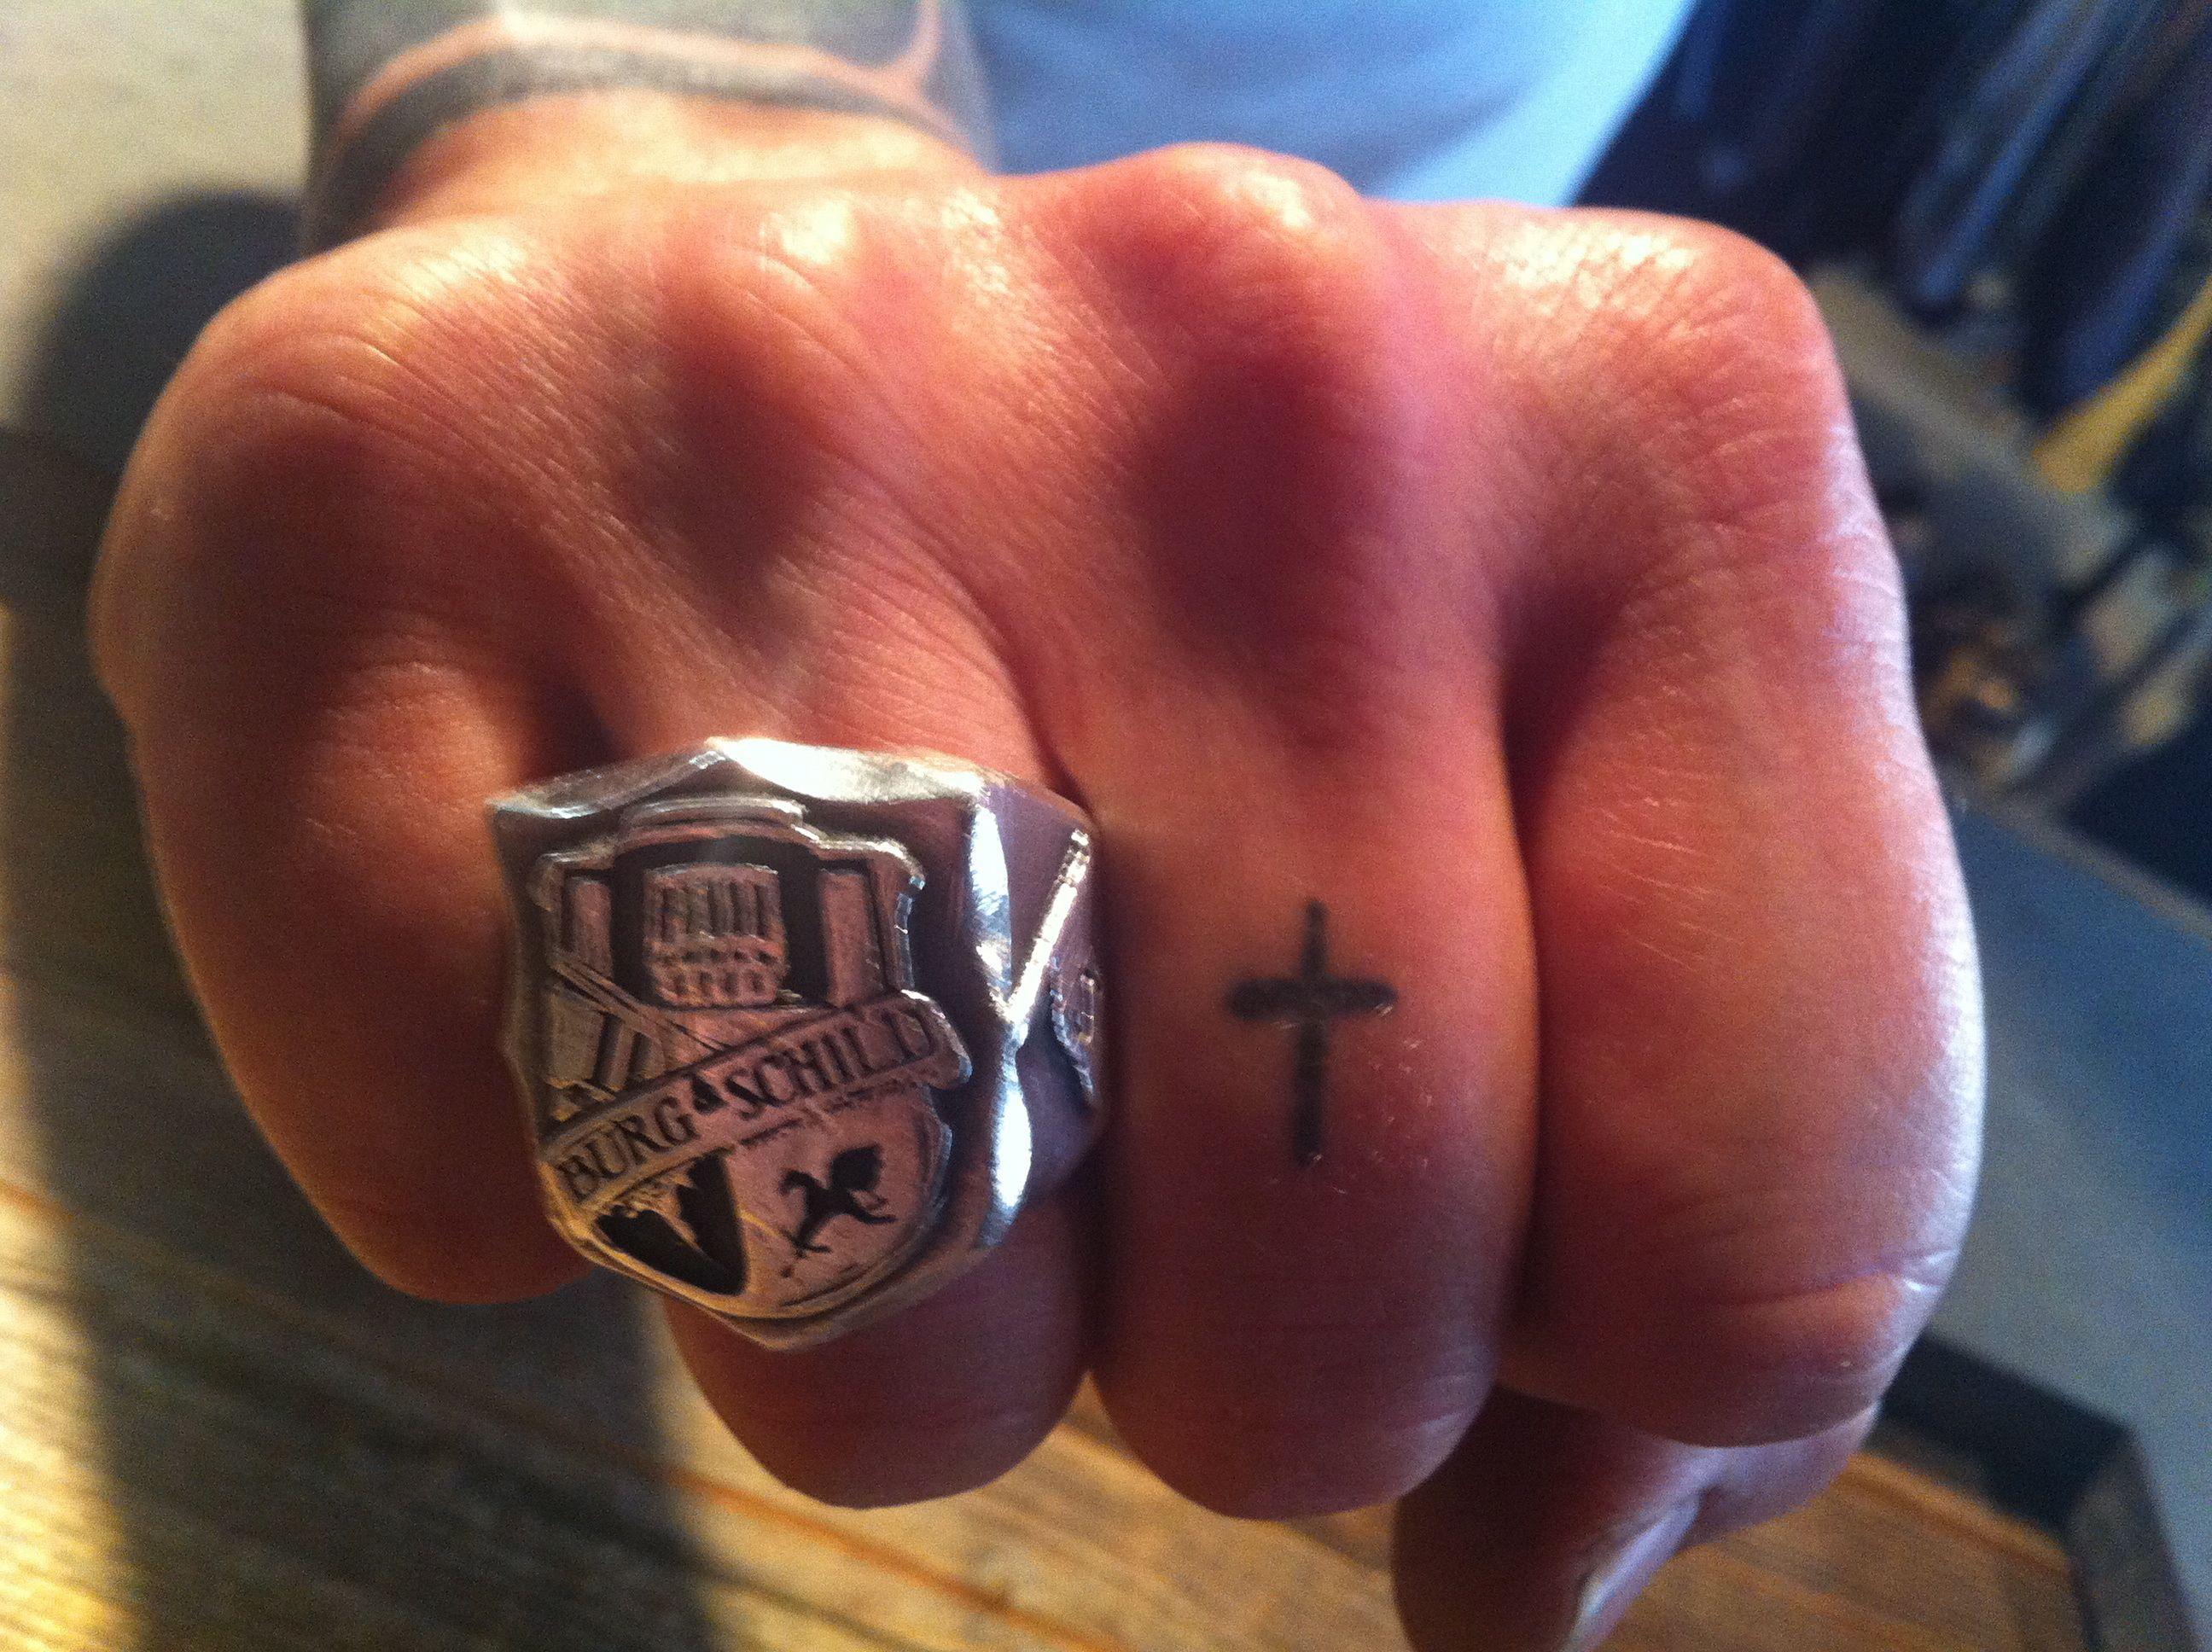 The Burg & Schild Ring!